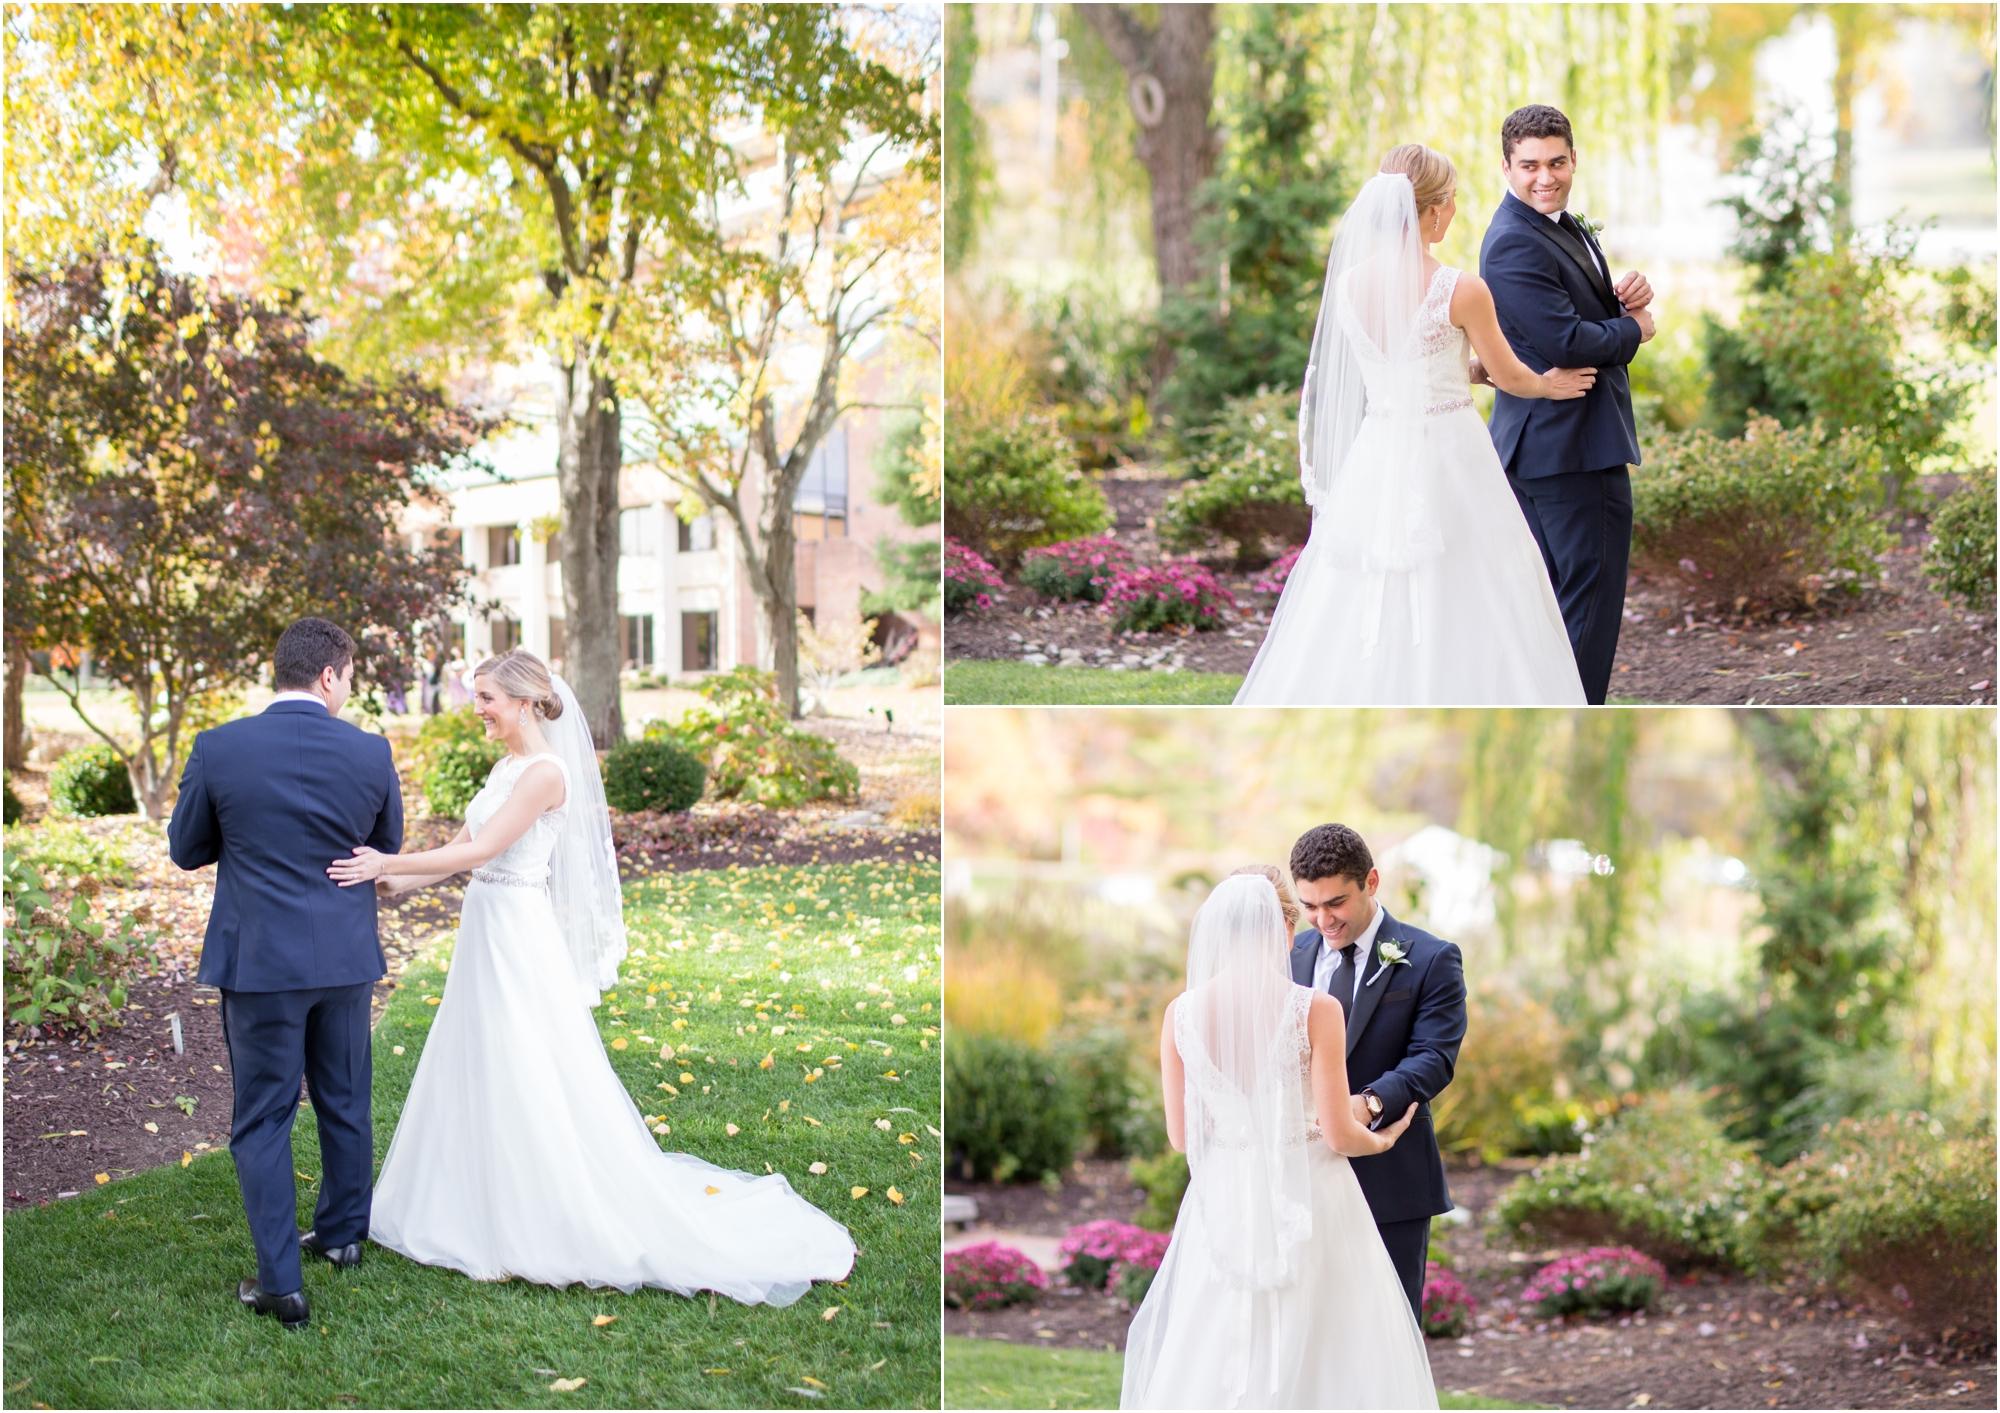 2-Finkel Wedding Bride & Groom Portraits-169_anna grace photography maryland wedding photographer turf valley.jpg